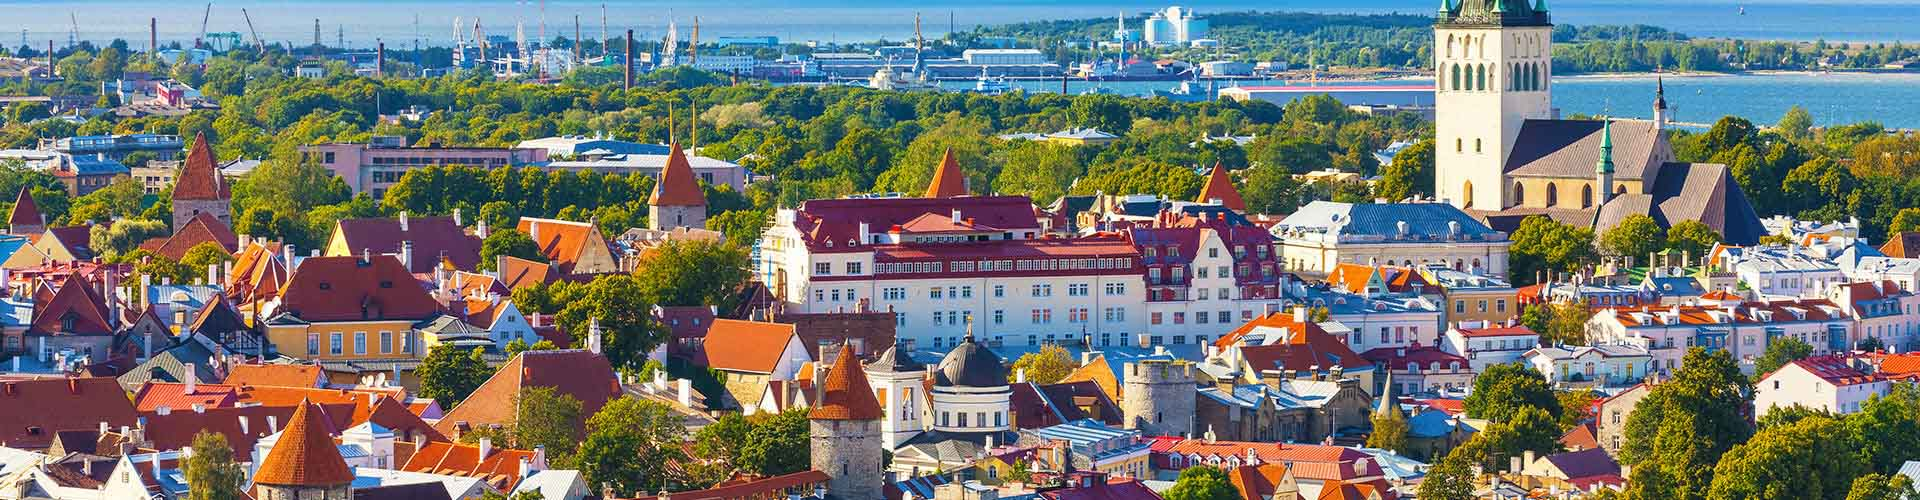 Tallinn – Albergues em Tallinn. Mapas para Tallinn, Fotos e Avaliações para cada Albergue em Tallinn.